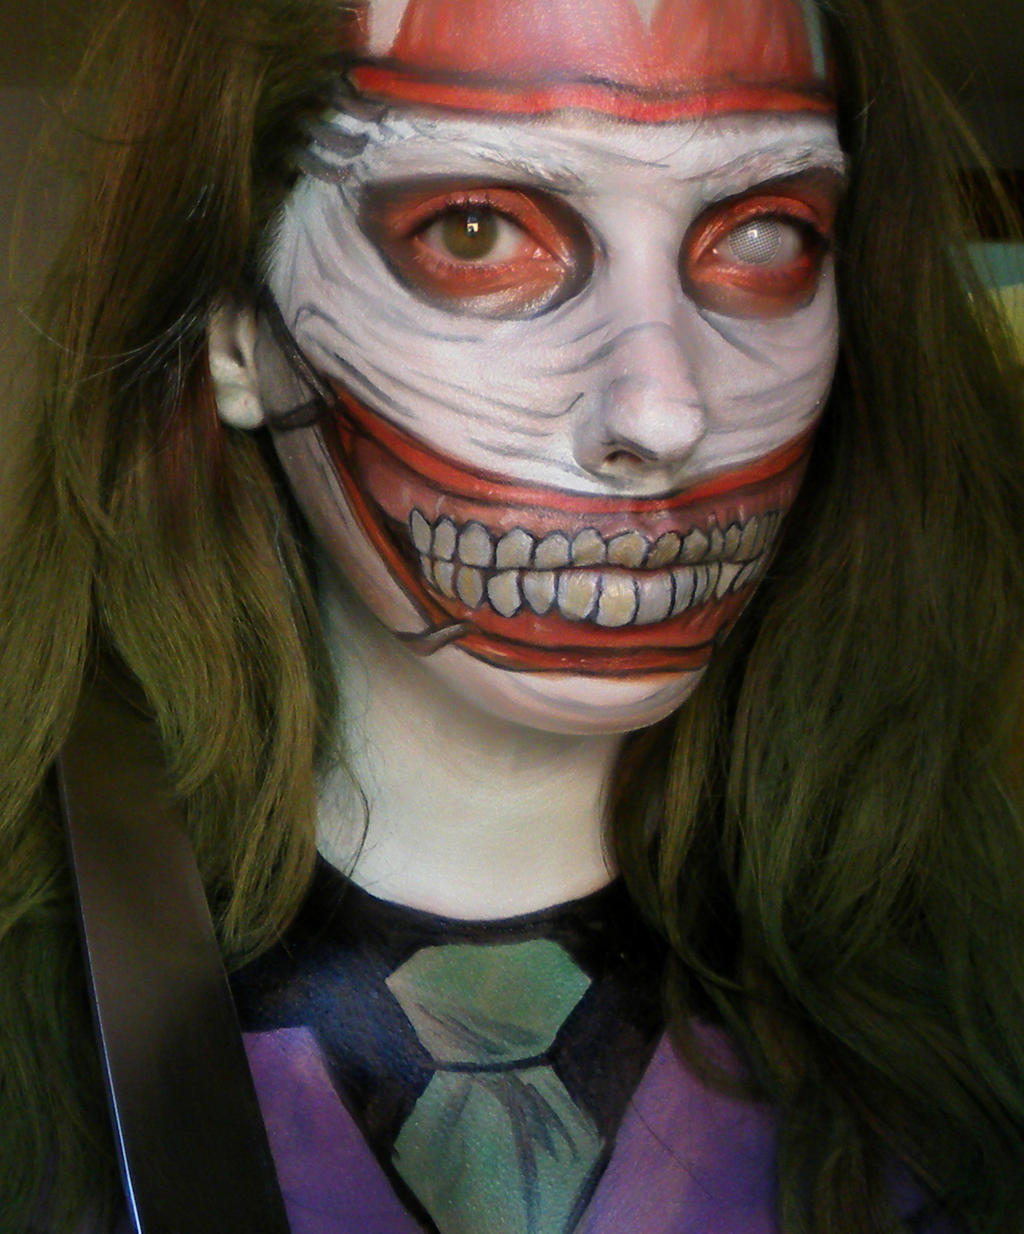 Joker Face Makeup By Marymakeup On DeviantArt